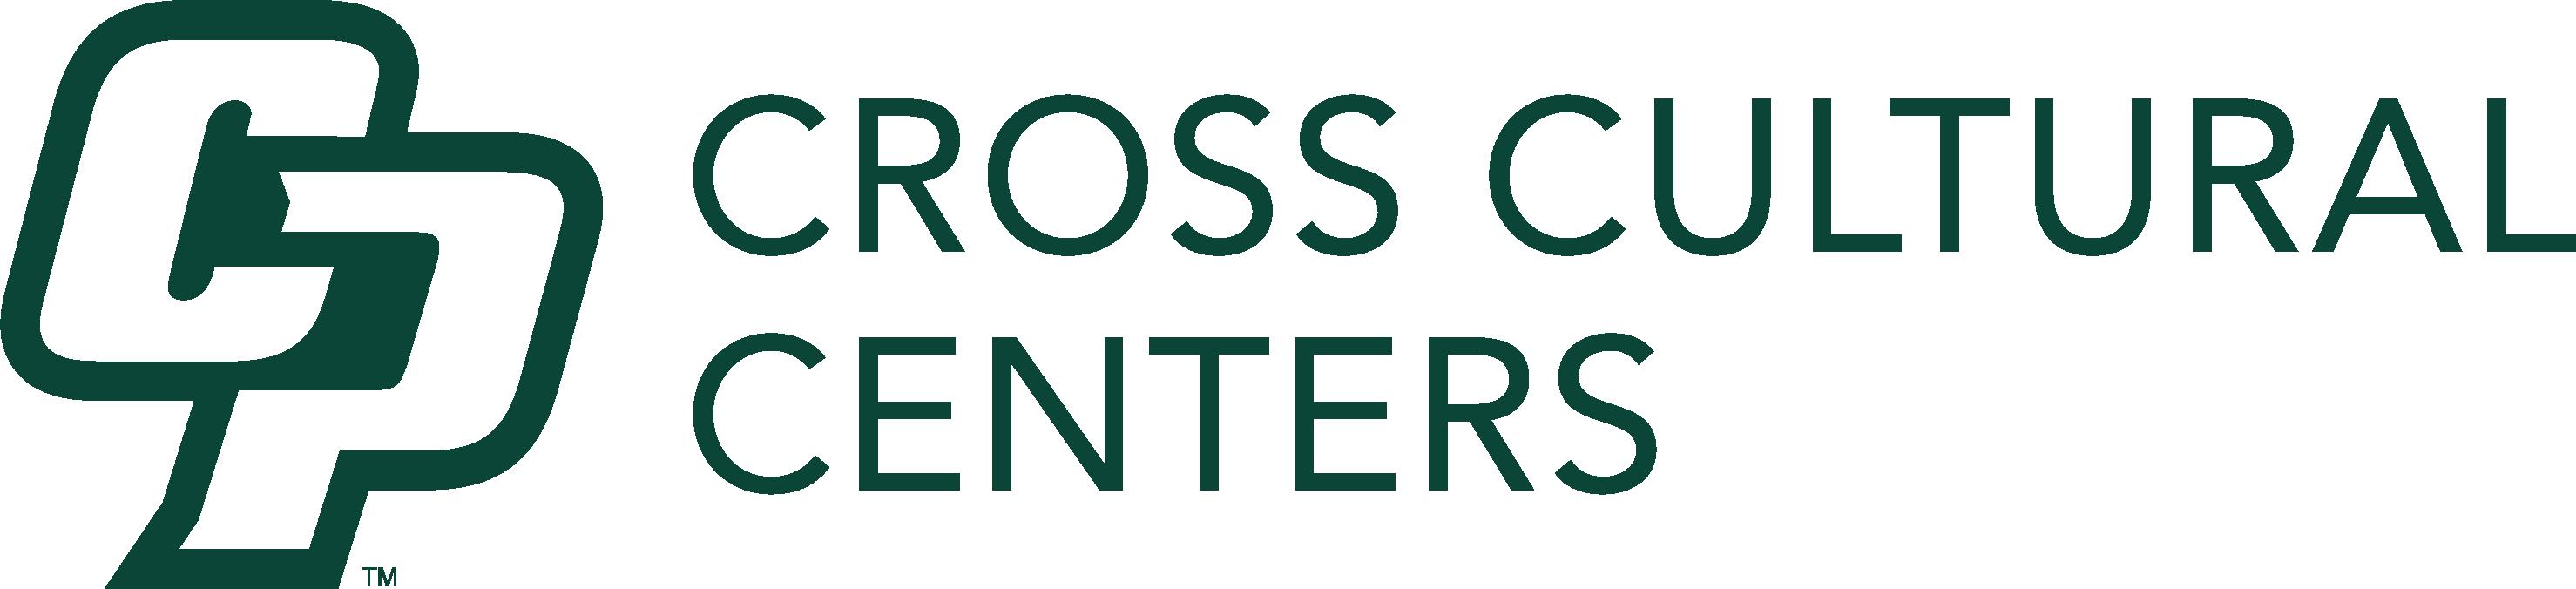 CP Cross Cultural Centers